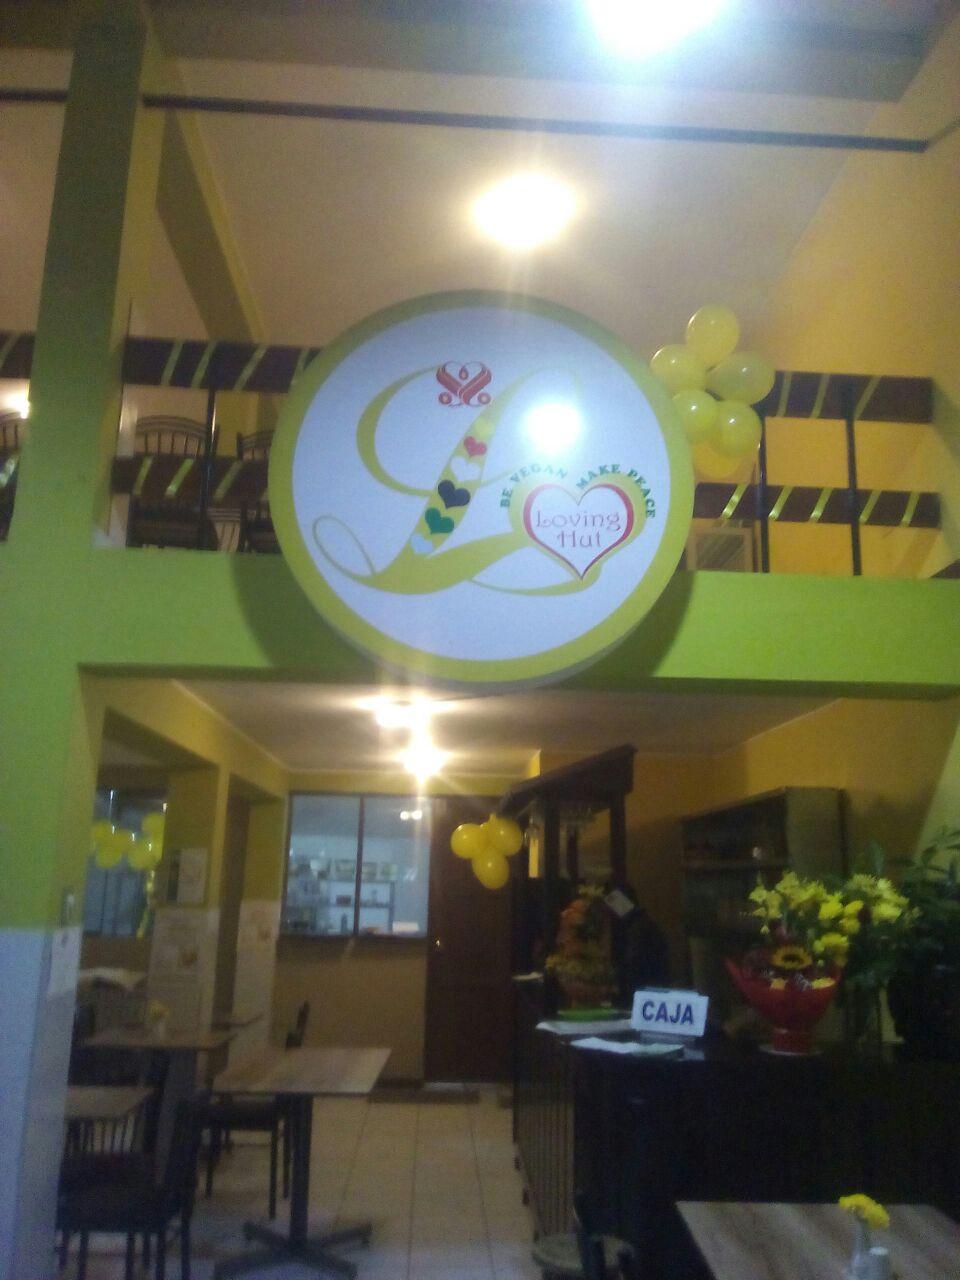 Loving Hut Peru Vegan Vegetarian Fast Food Restaurant